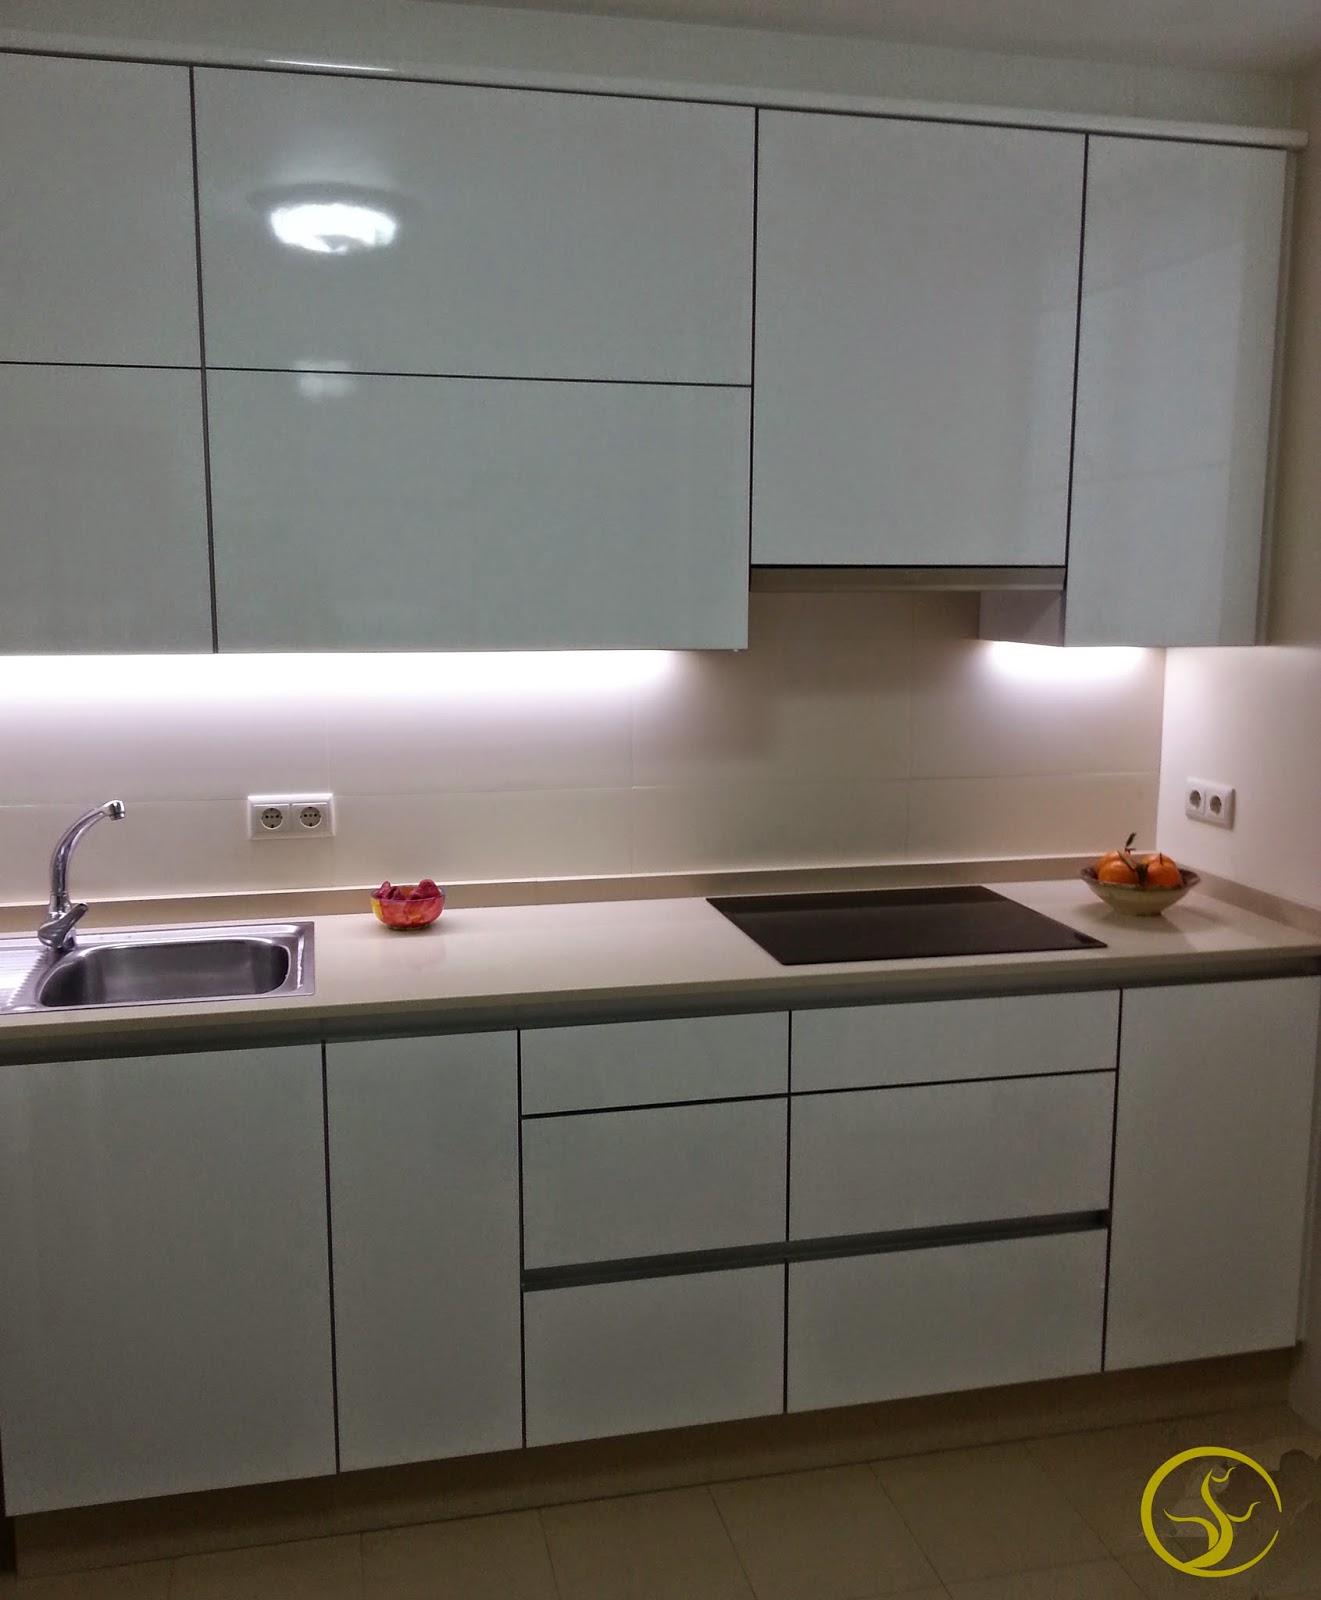 Puertas De Cocina Formica Magonz Com La Idea De Dise O De La  # Muebles Sostenibles